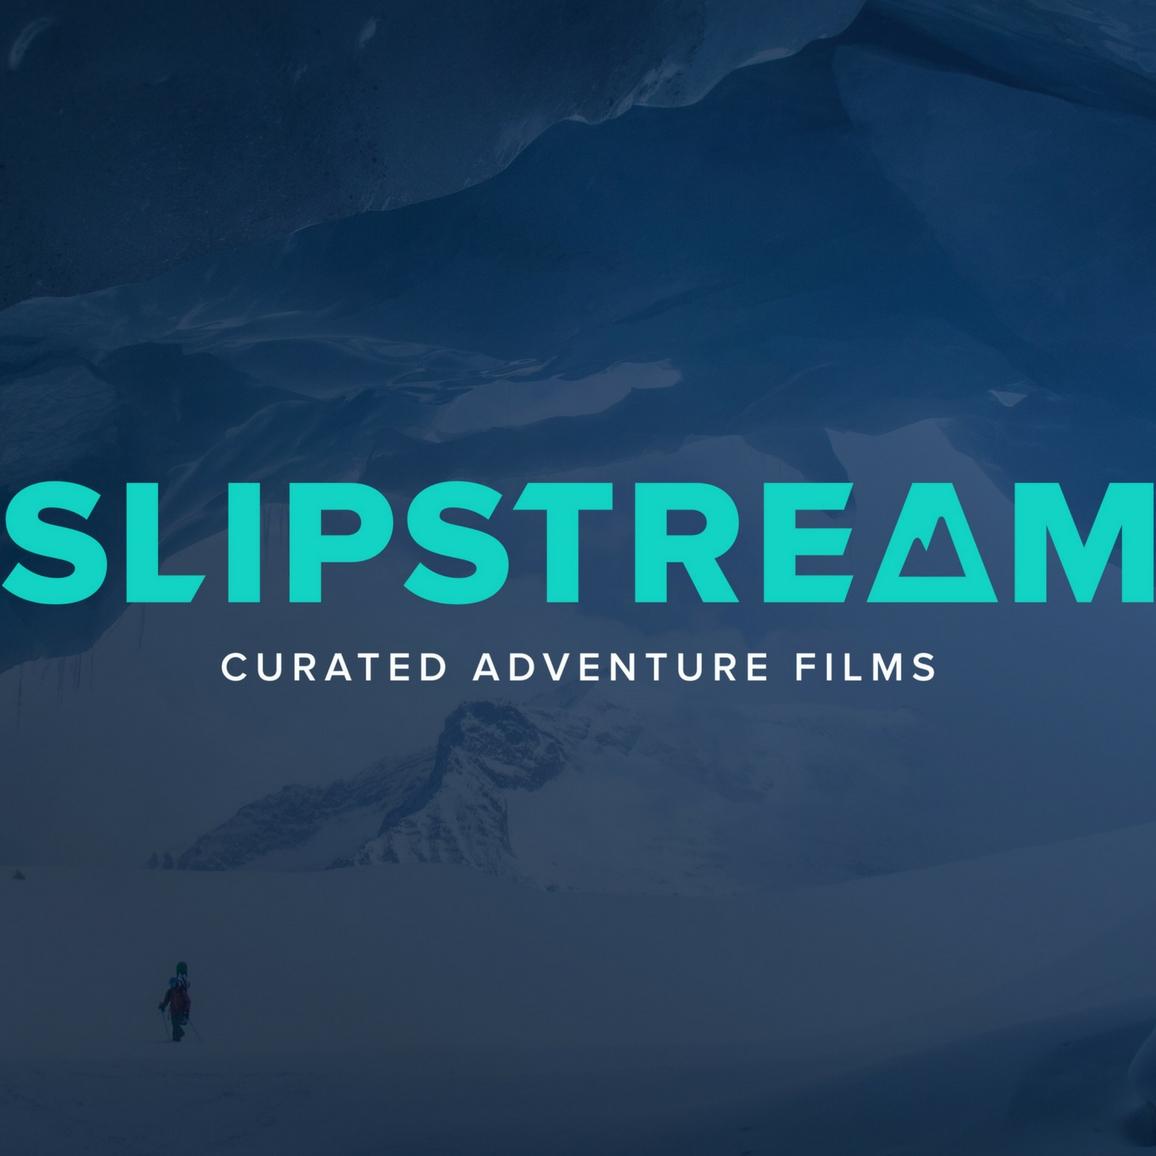 Slipstream Brand image (1).jpg